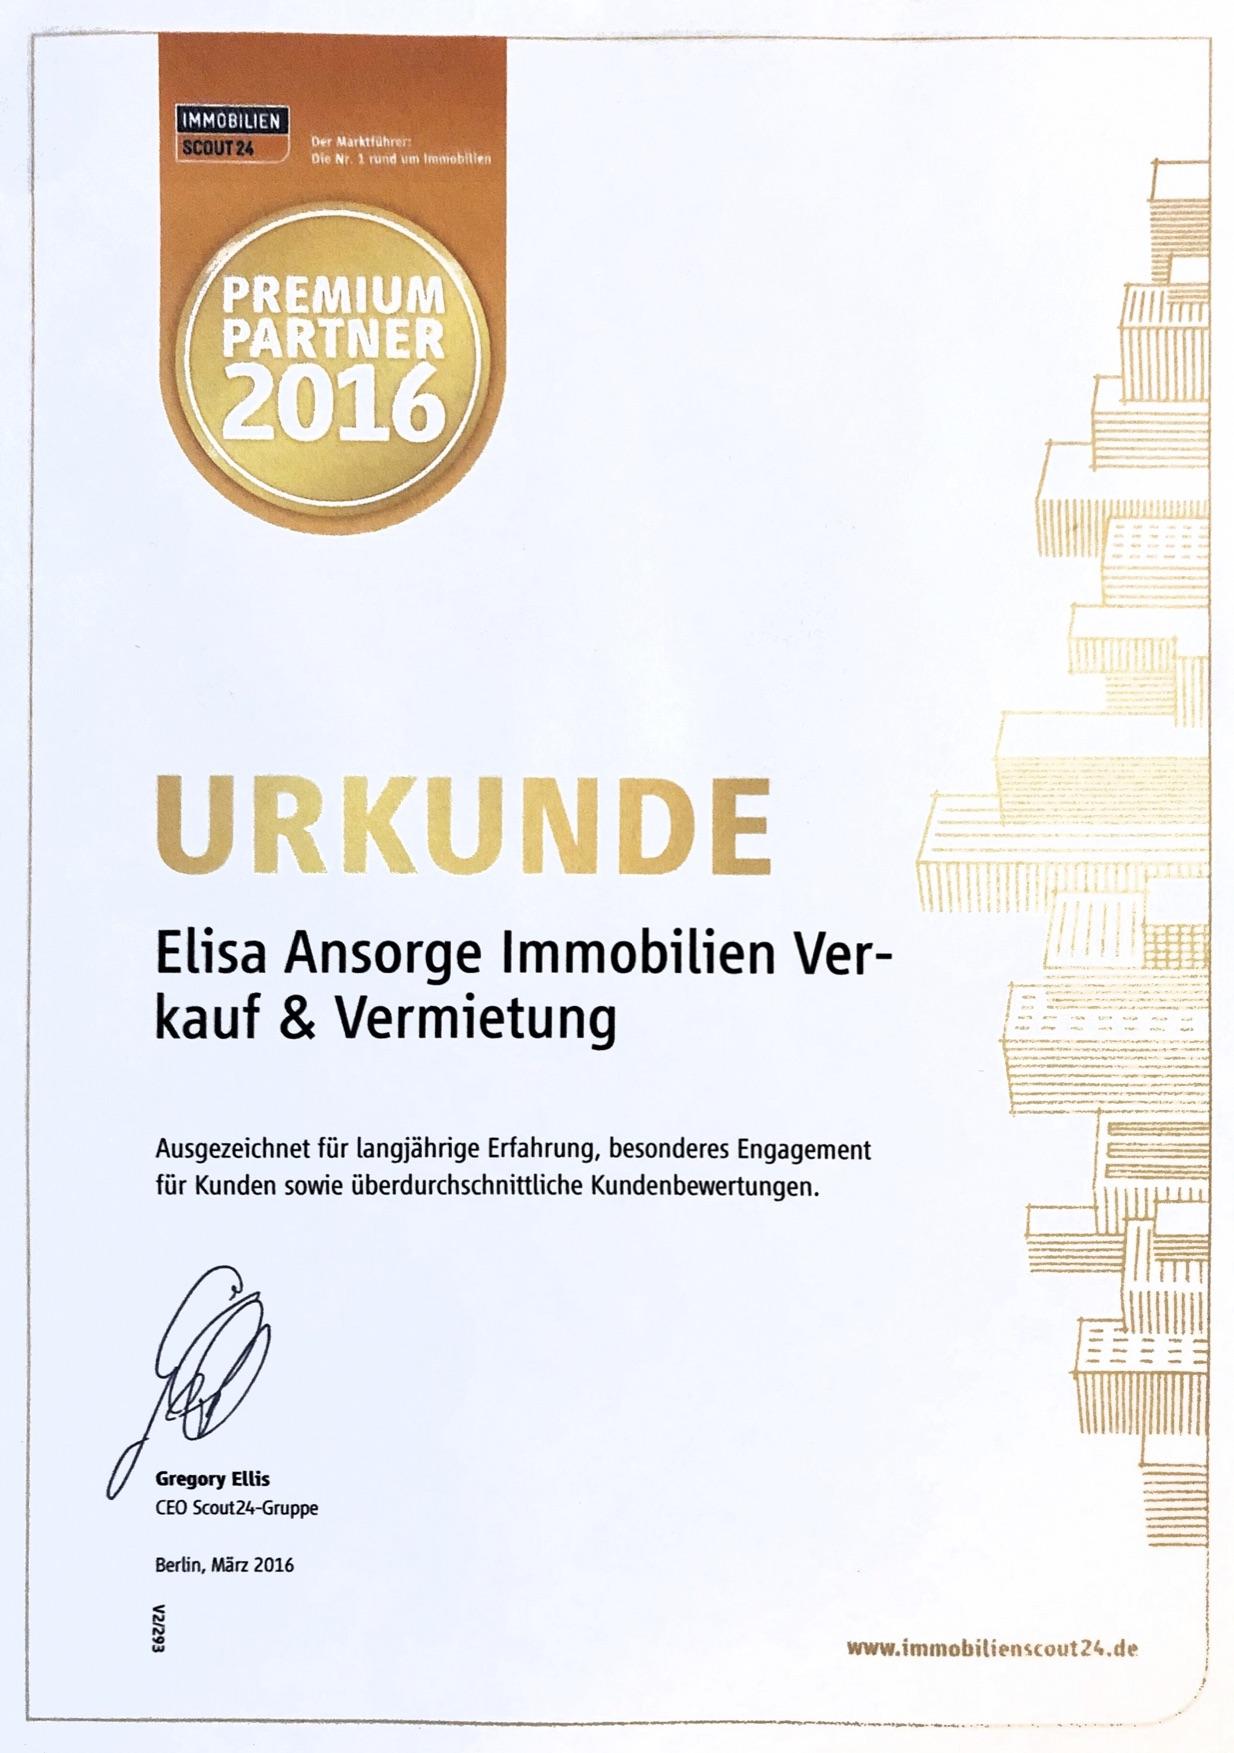 immobilienscout Premium Partner Urkunde